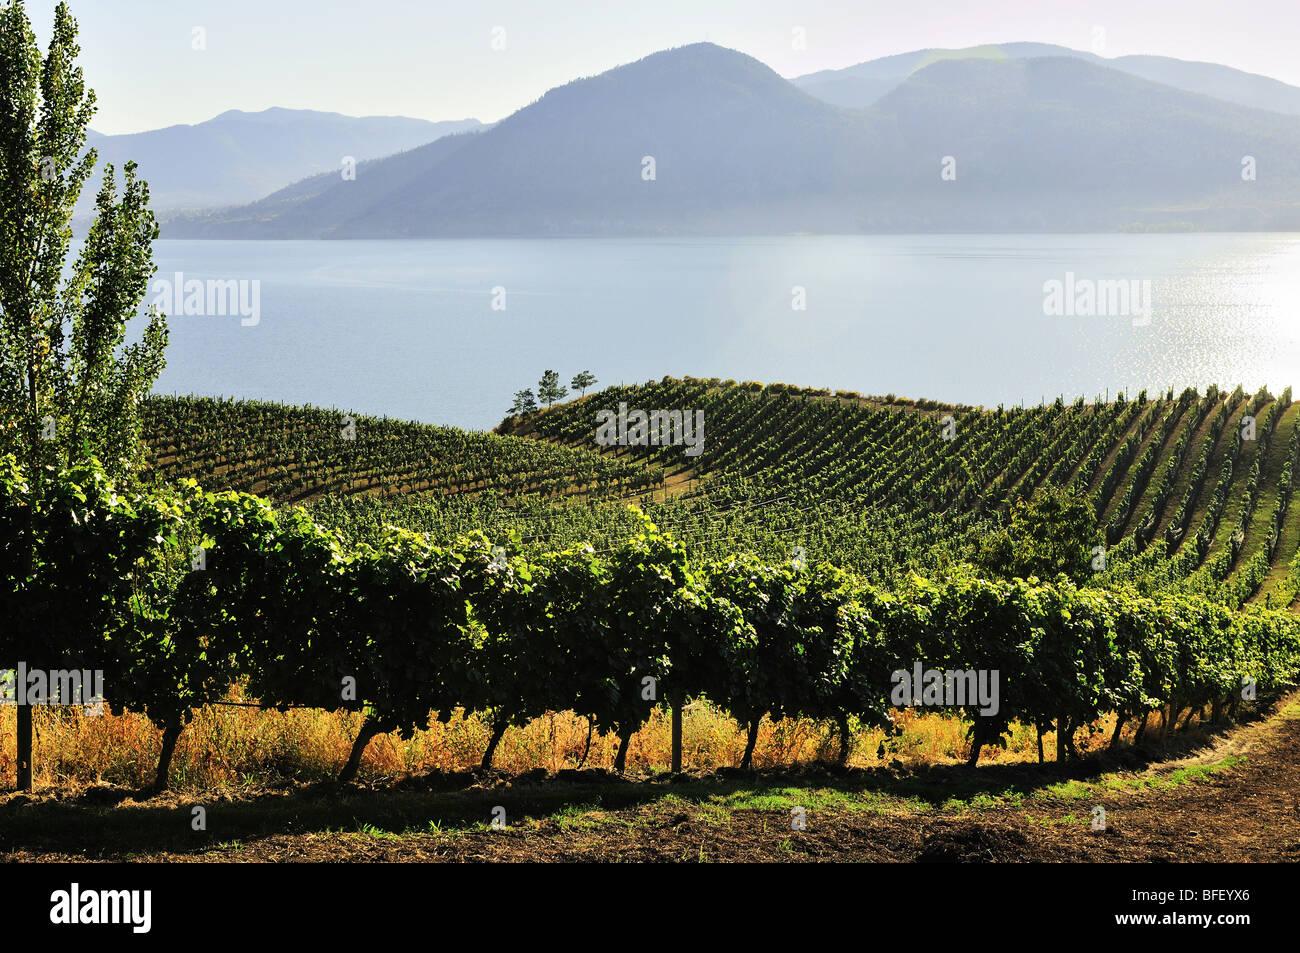 Lake Breeze Vineyards in Naramata, BC., overlooking Okanagan Lake. - Stock Image